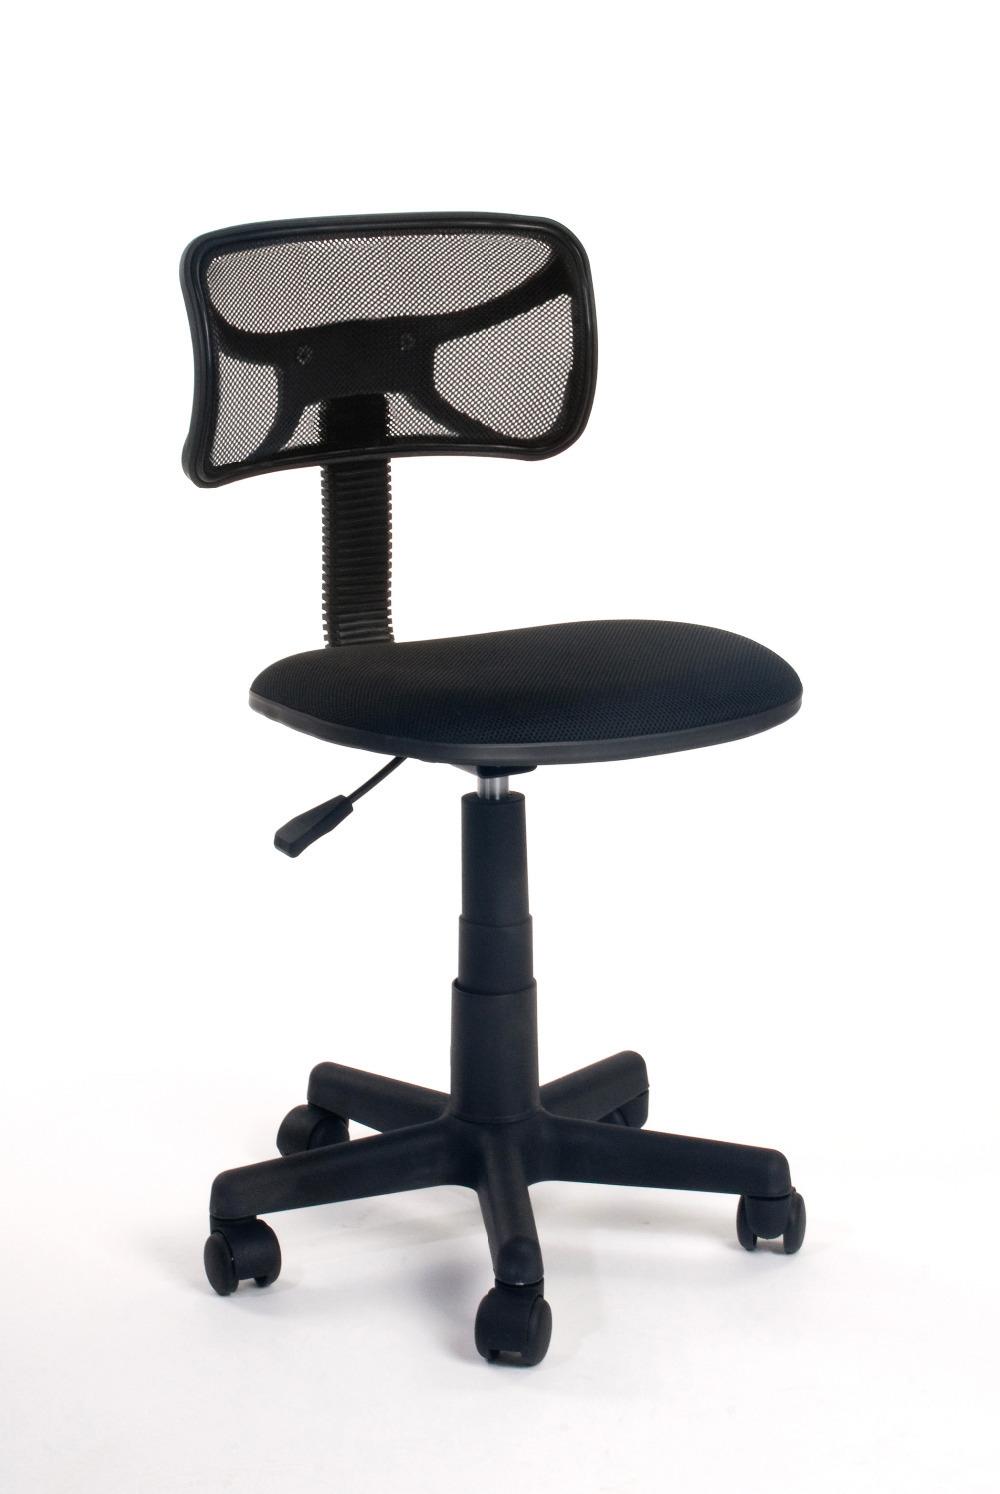 Oficina silla de la computadora negro en sillas de for Silla computadora